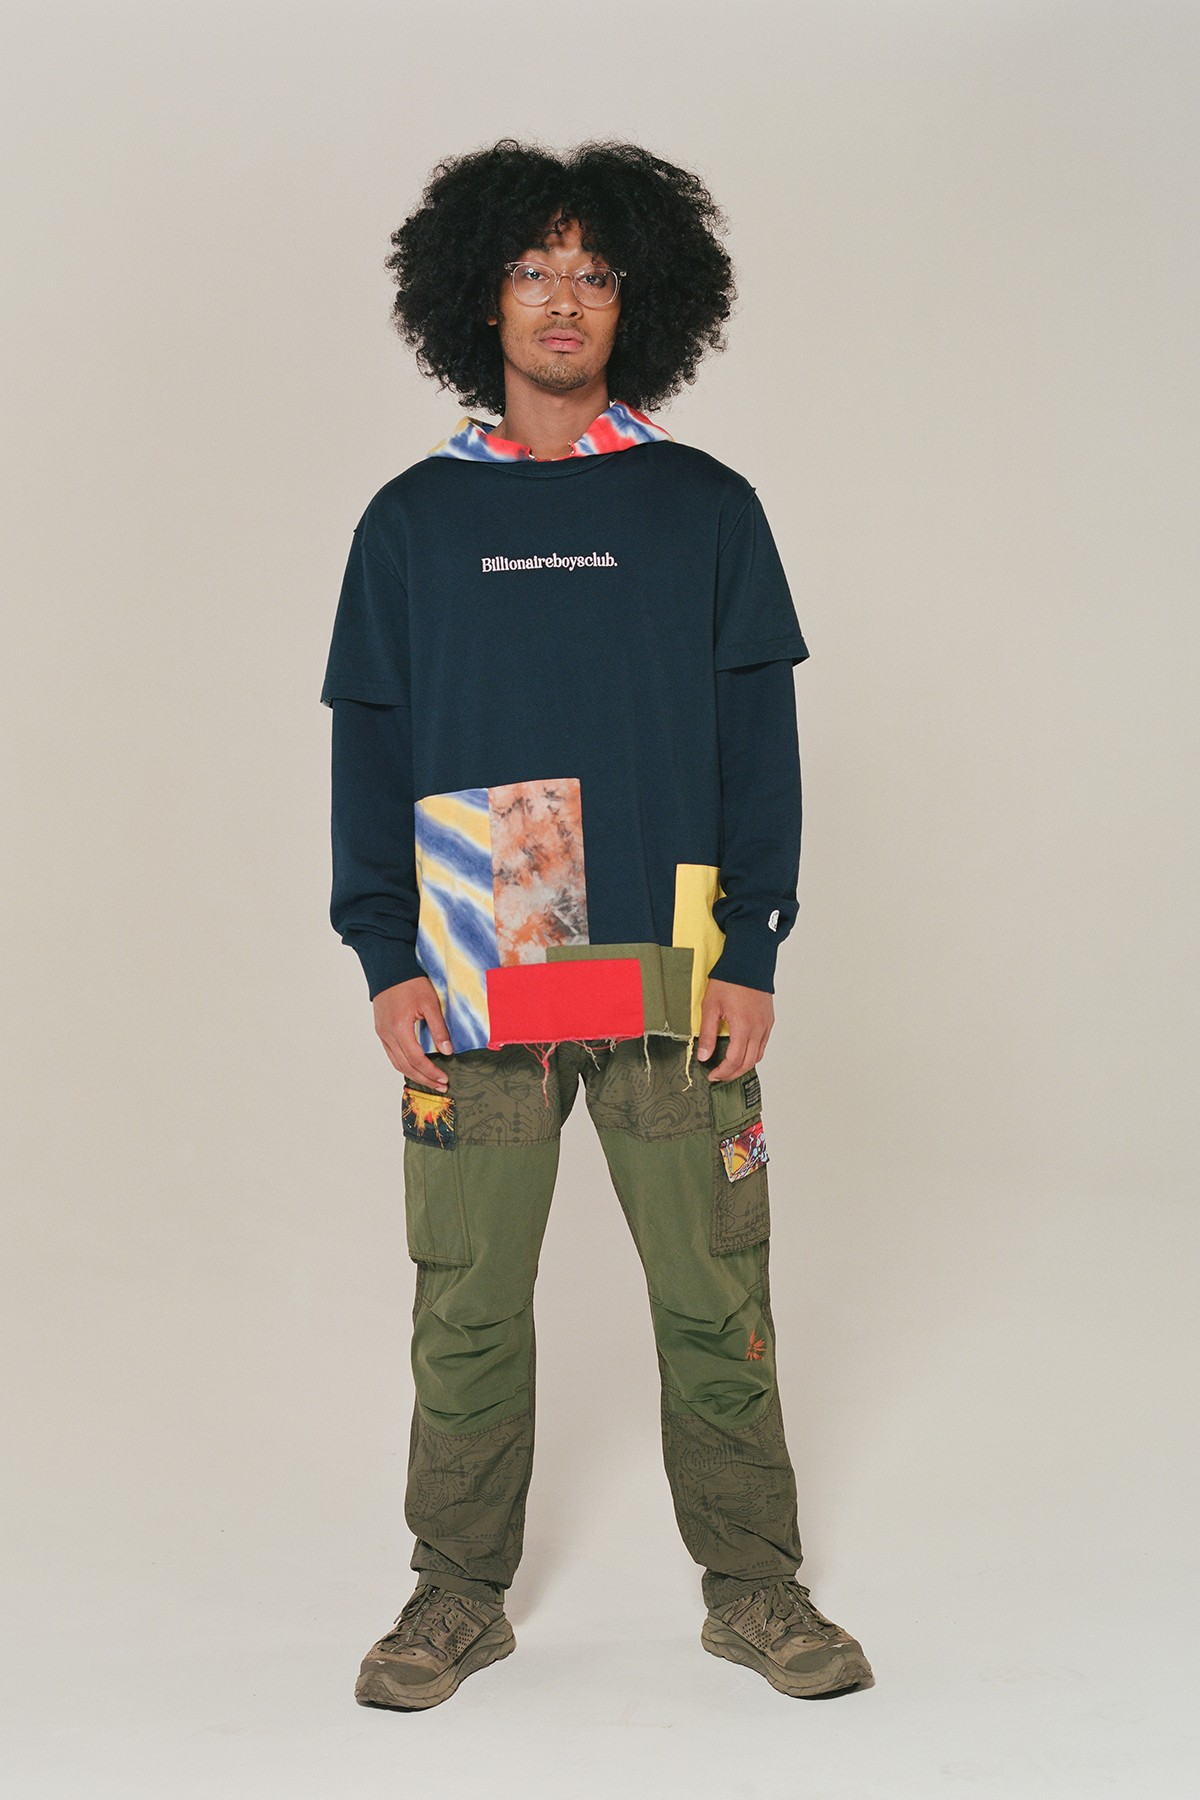 Supreme Fall Winter 2021 Week 3 Release Drop List Palace Skateboards Always Wet Boy Balansa Playboy AFB Praying Billionaire Boys Club WACKO MARIA JJJJound PORTER